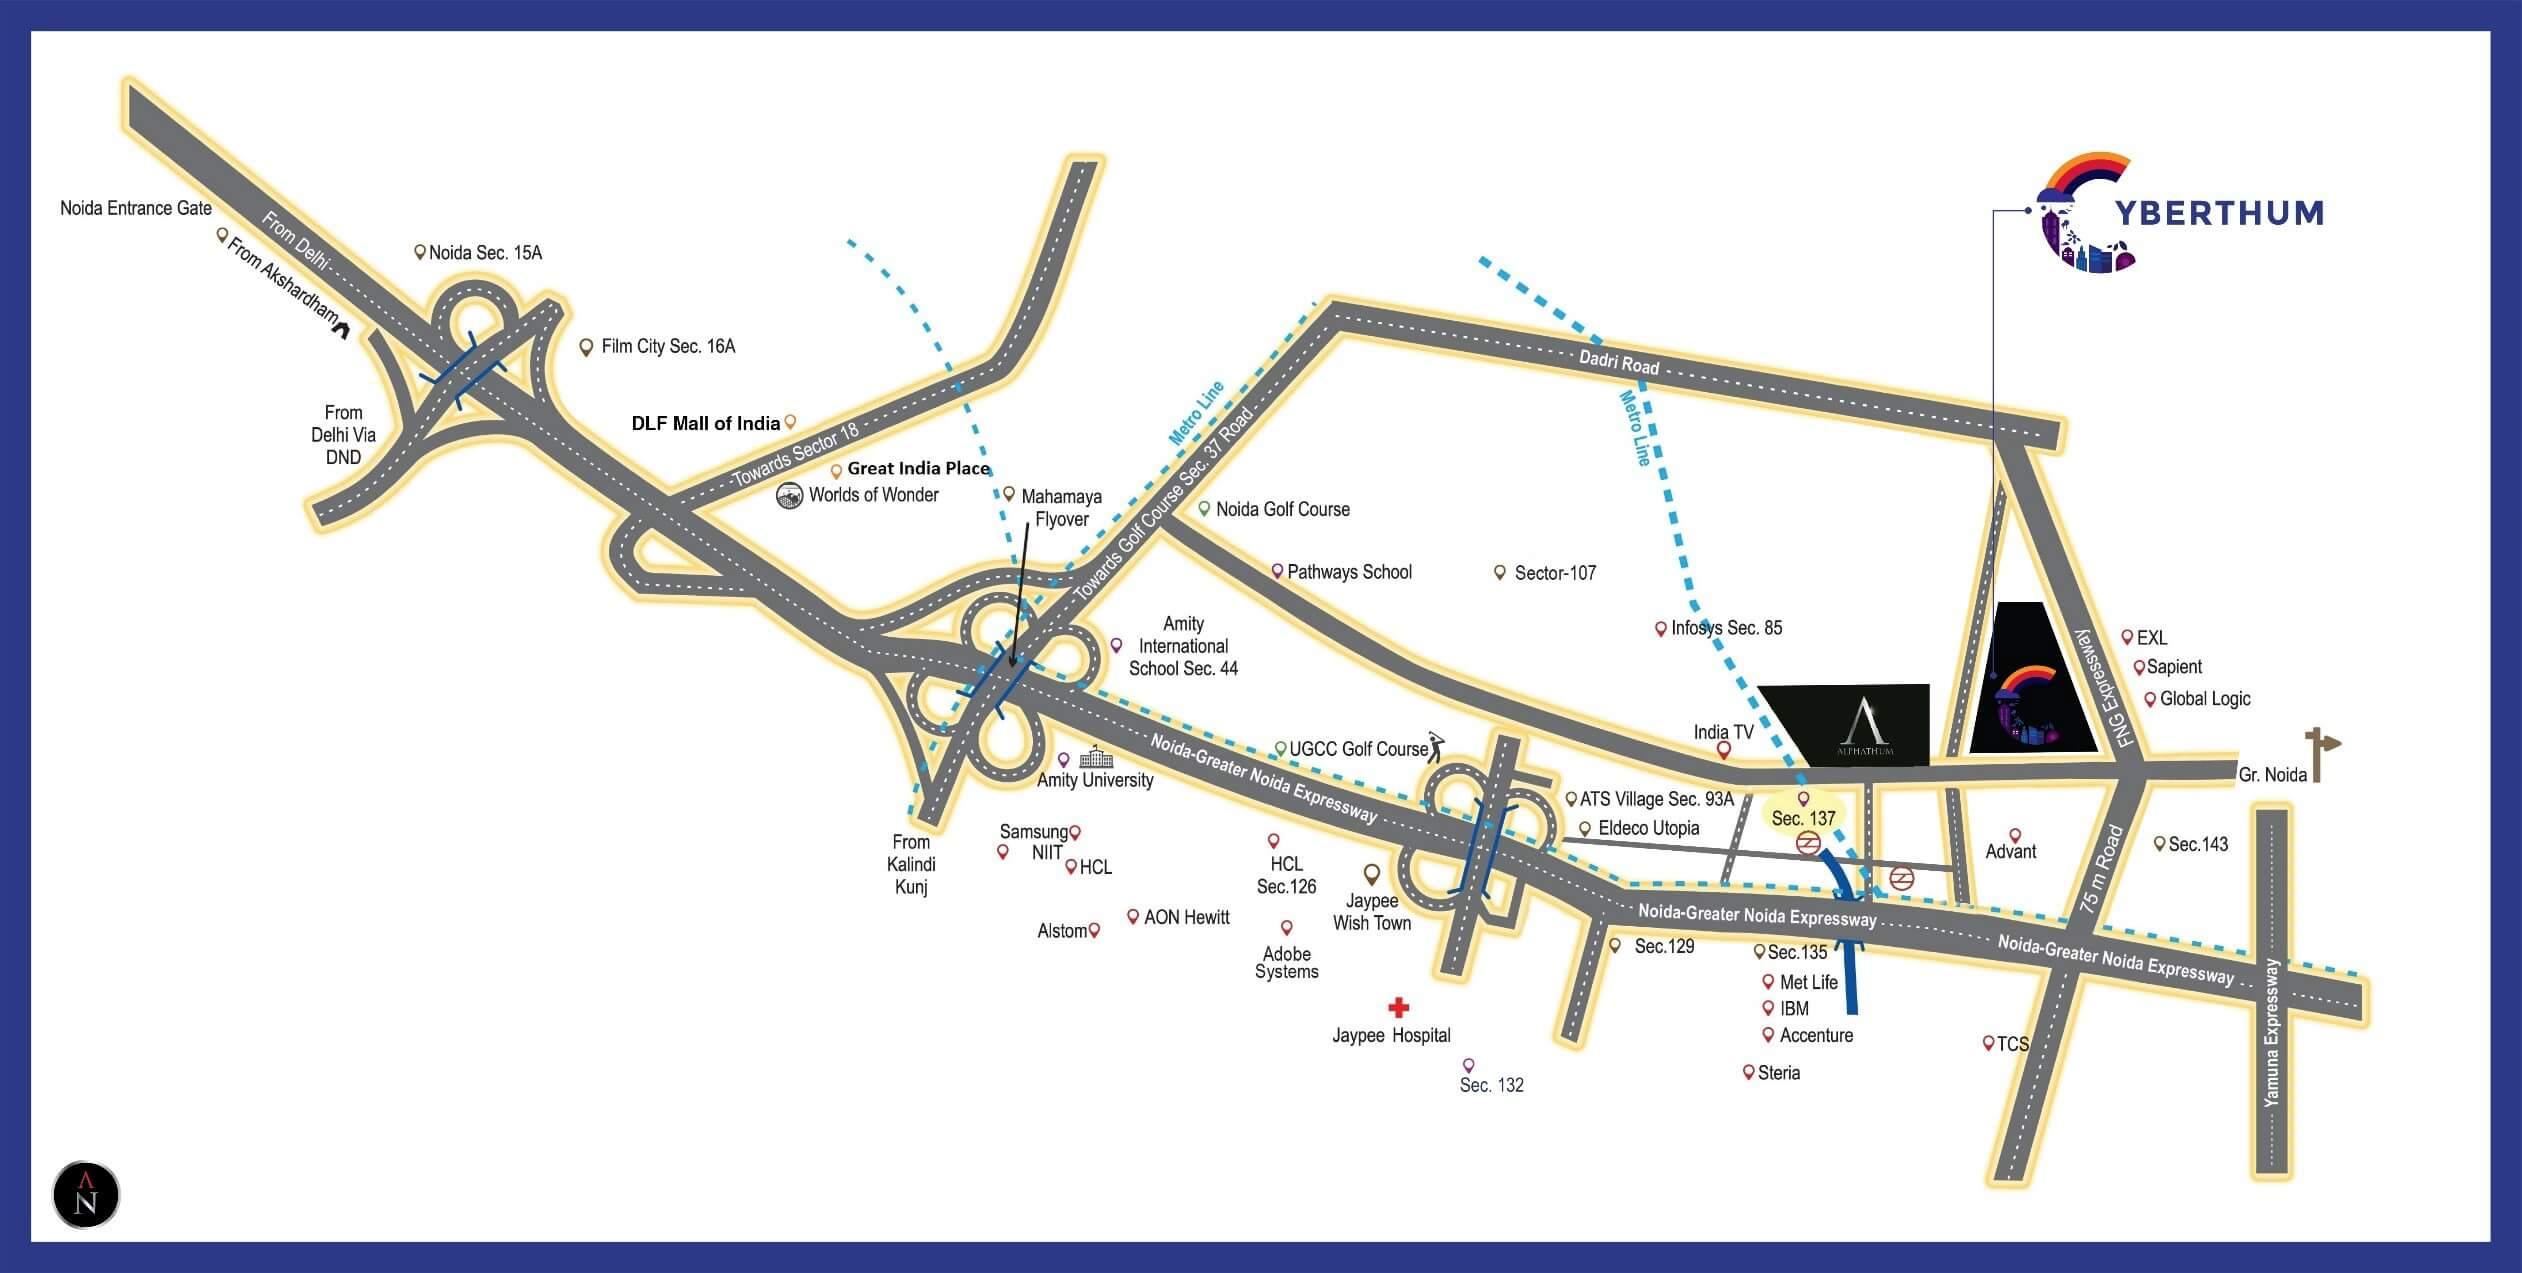 cyberthum location image1